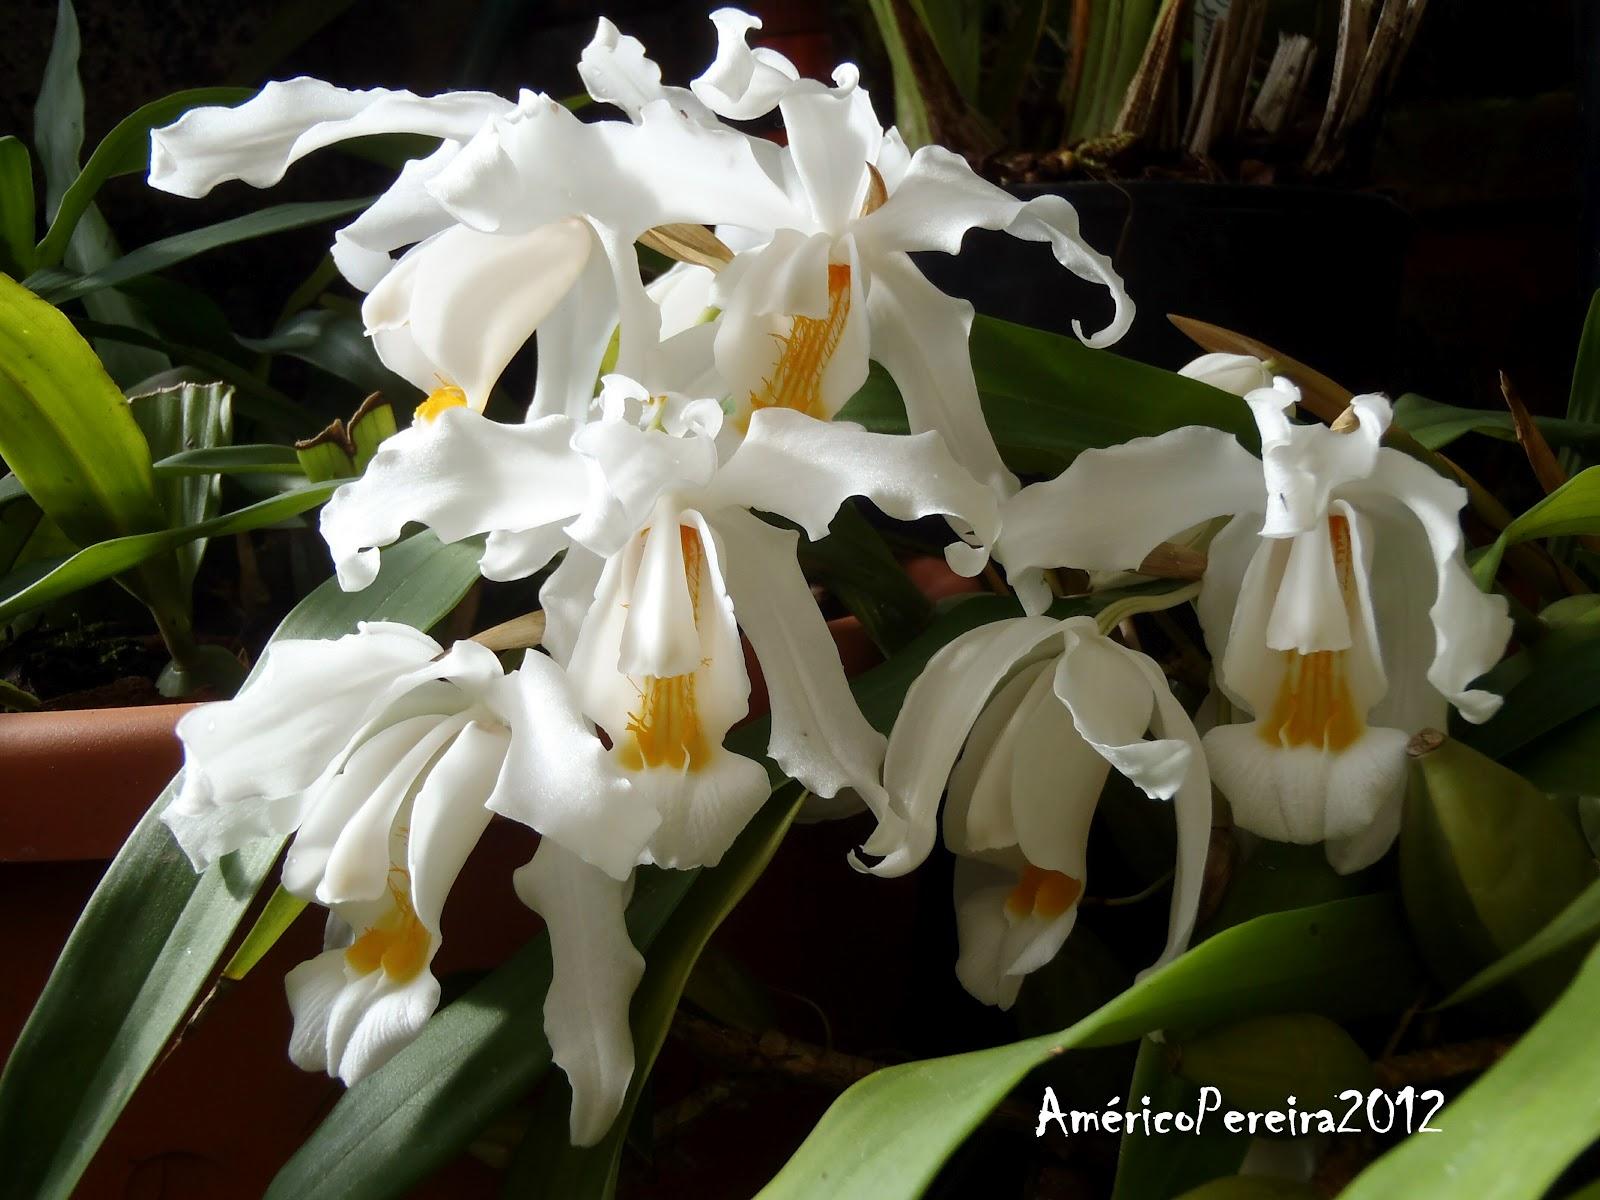 Orquidea Coelogyne Cristata Coelogyne Cristata Apesar de